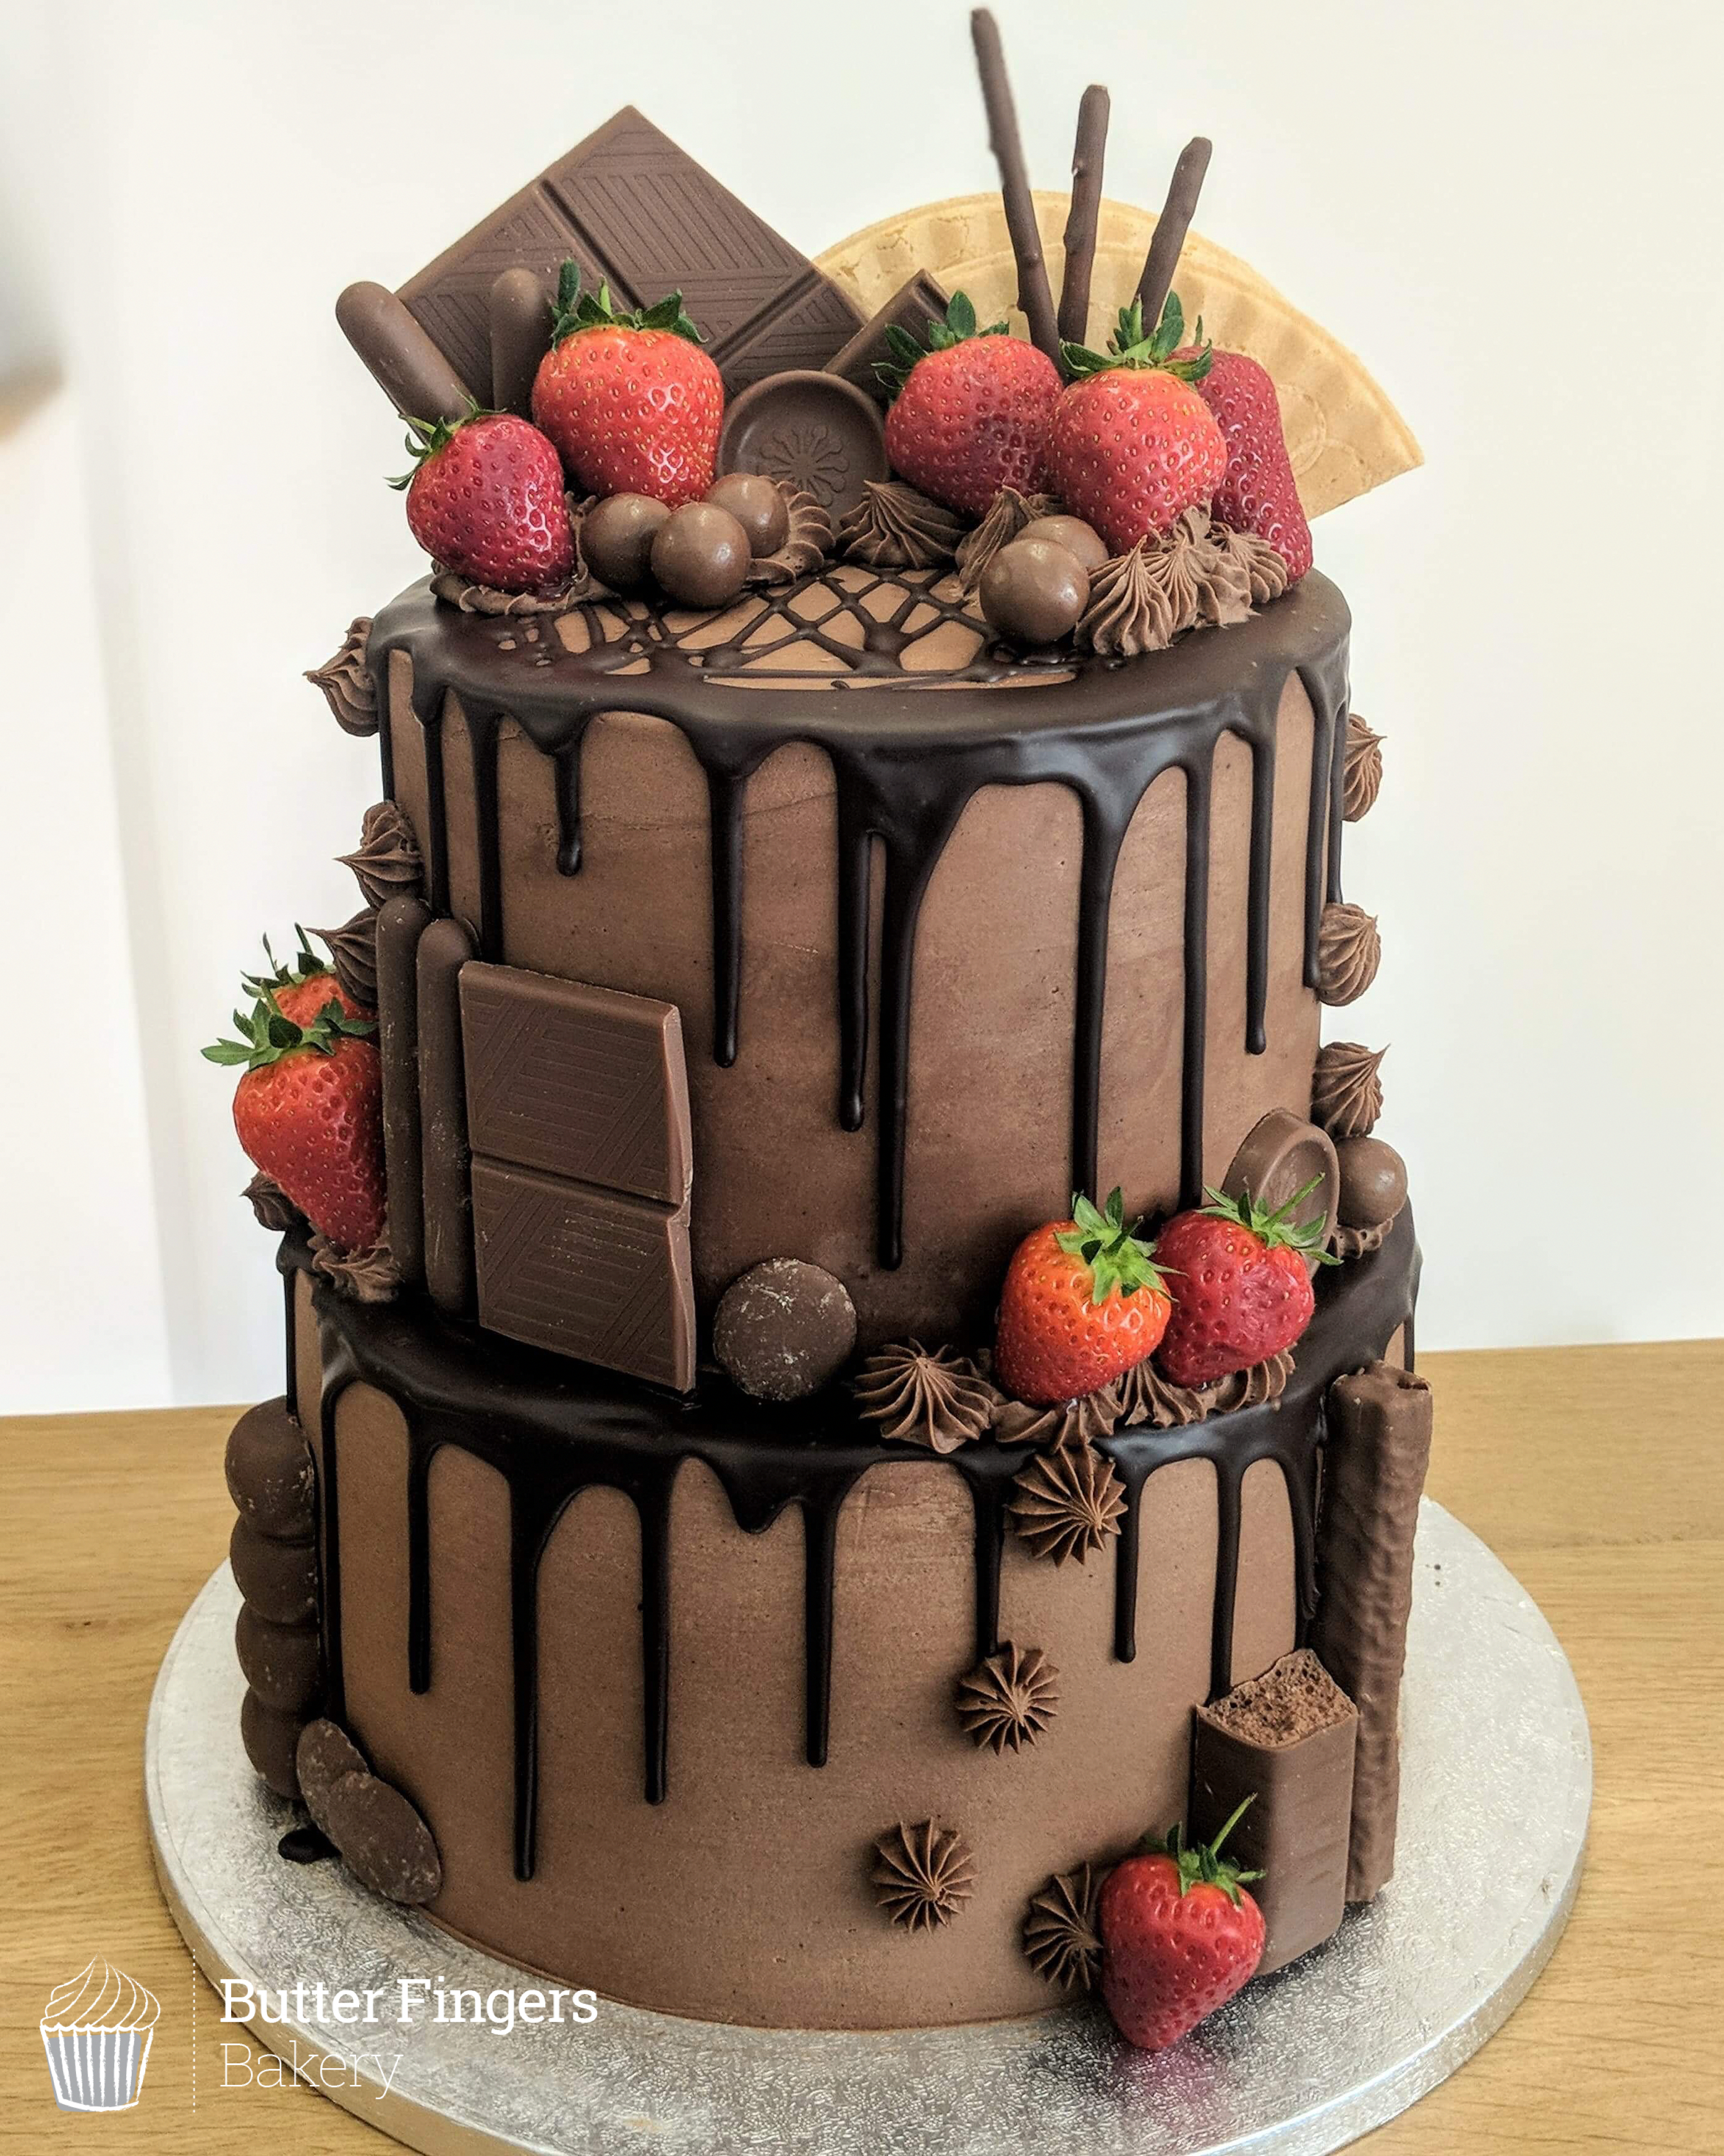 A Two Tier Chocolate Overload Drip Cake Decorated With Strawberries Birthday Birthdaycake Chocolat Strawberry Cakes Homemade Cakes Chocolate Cake Decoration